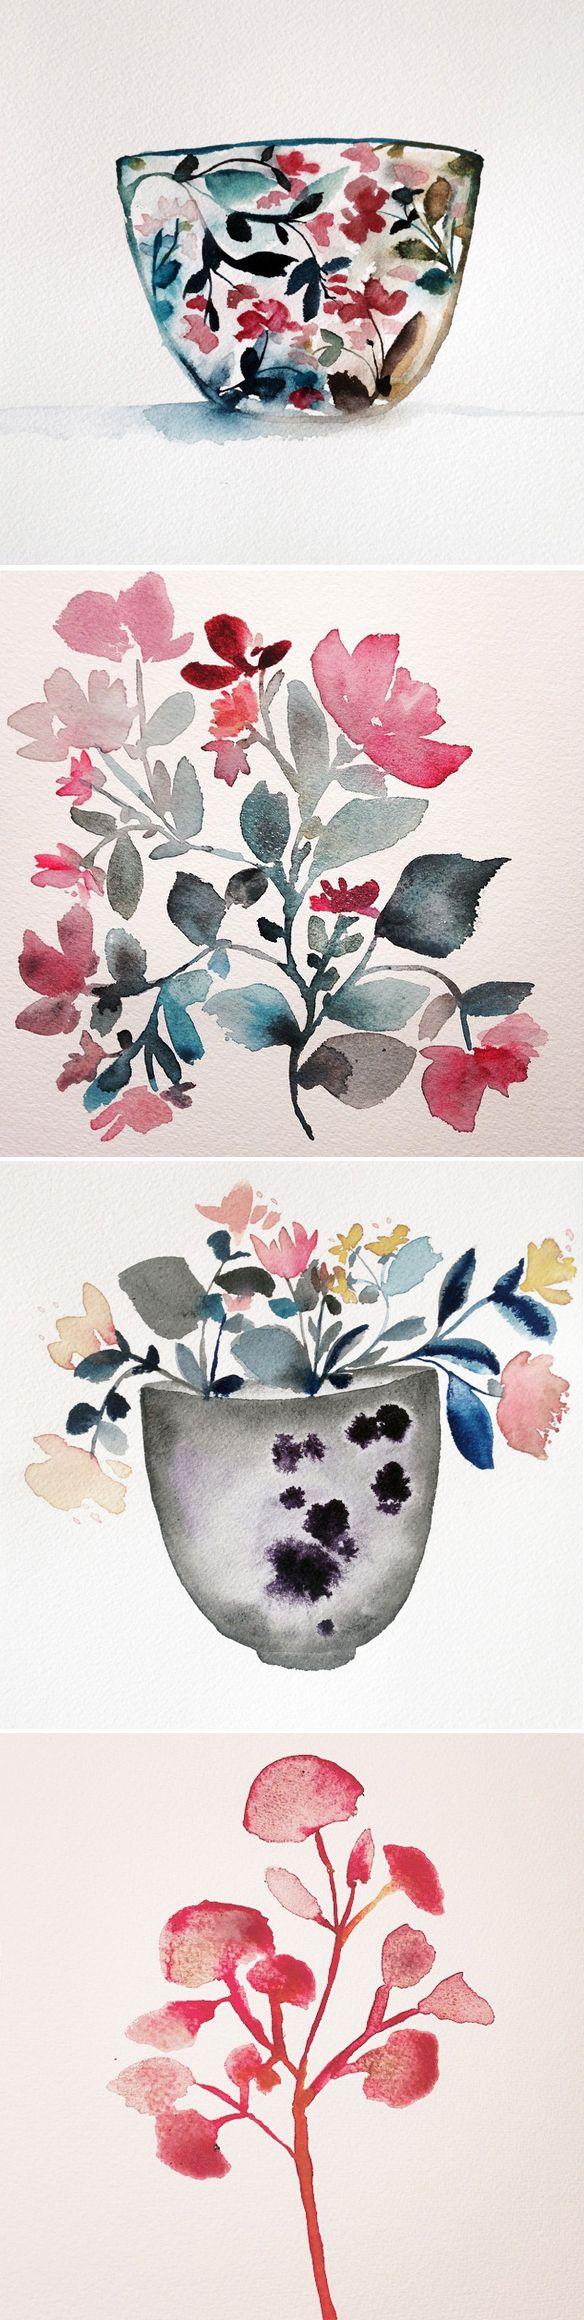 watercolors by kiana mosley